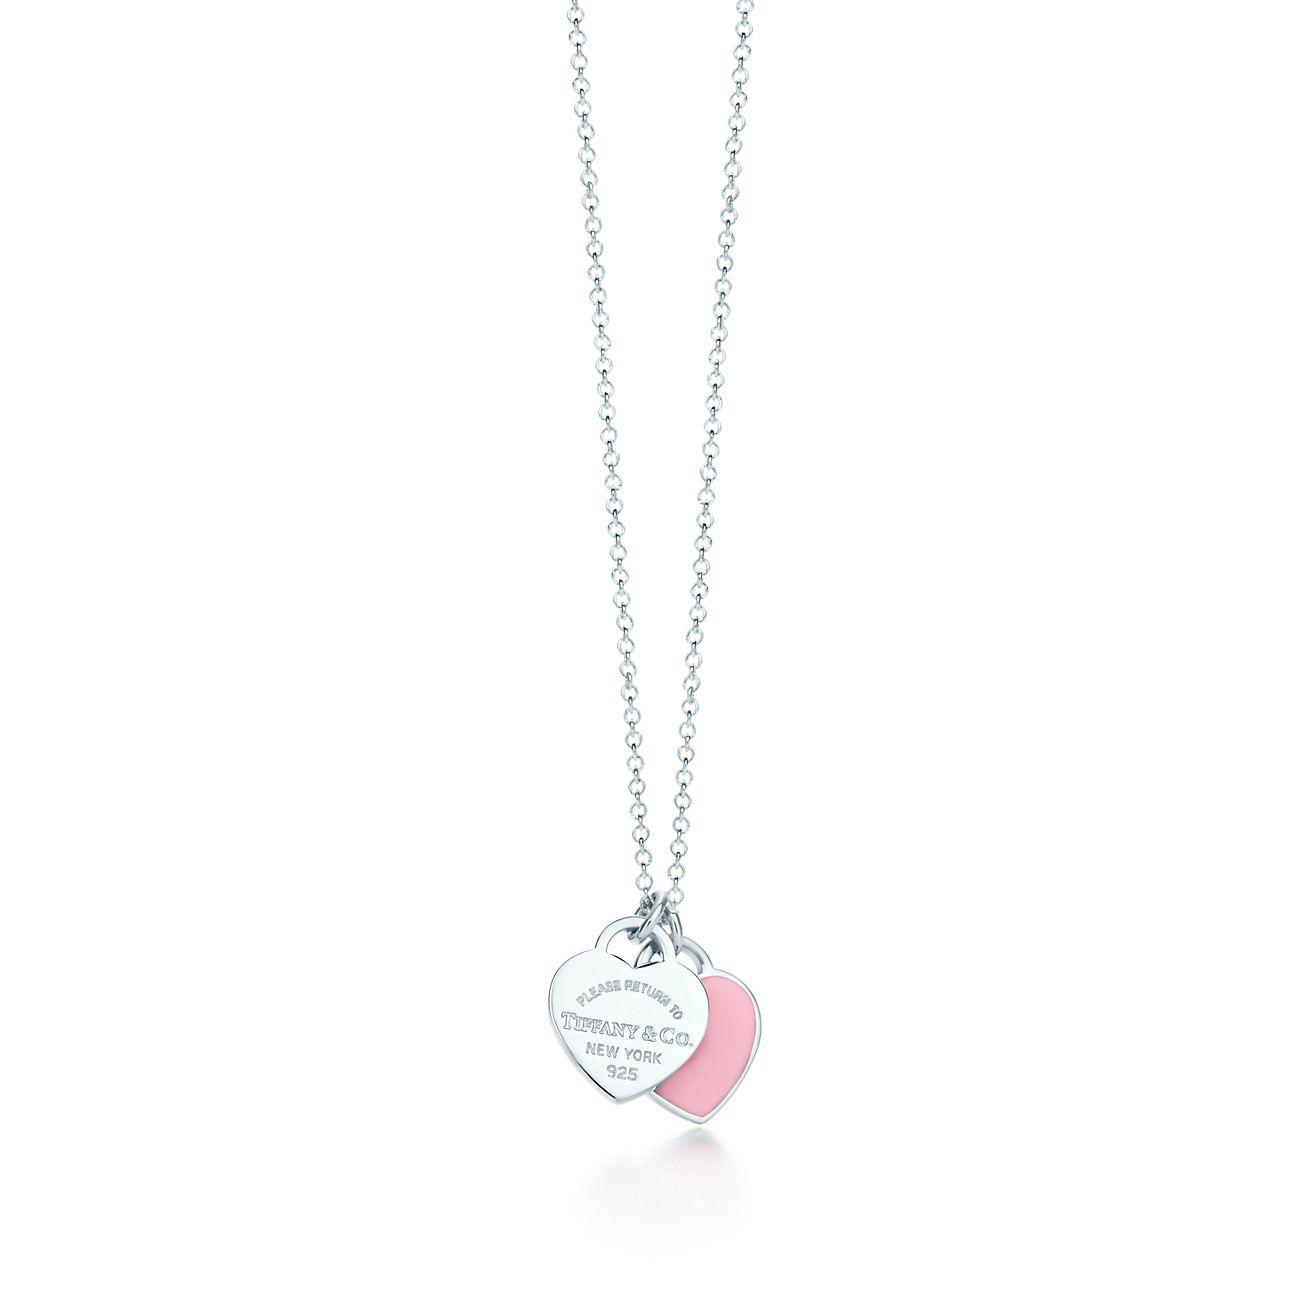 Tiffany Infinity pendant in sterling silver with Tiffany Blue enamel finish Tiffany & Co.